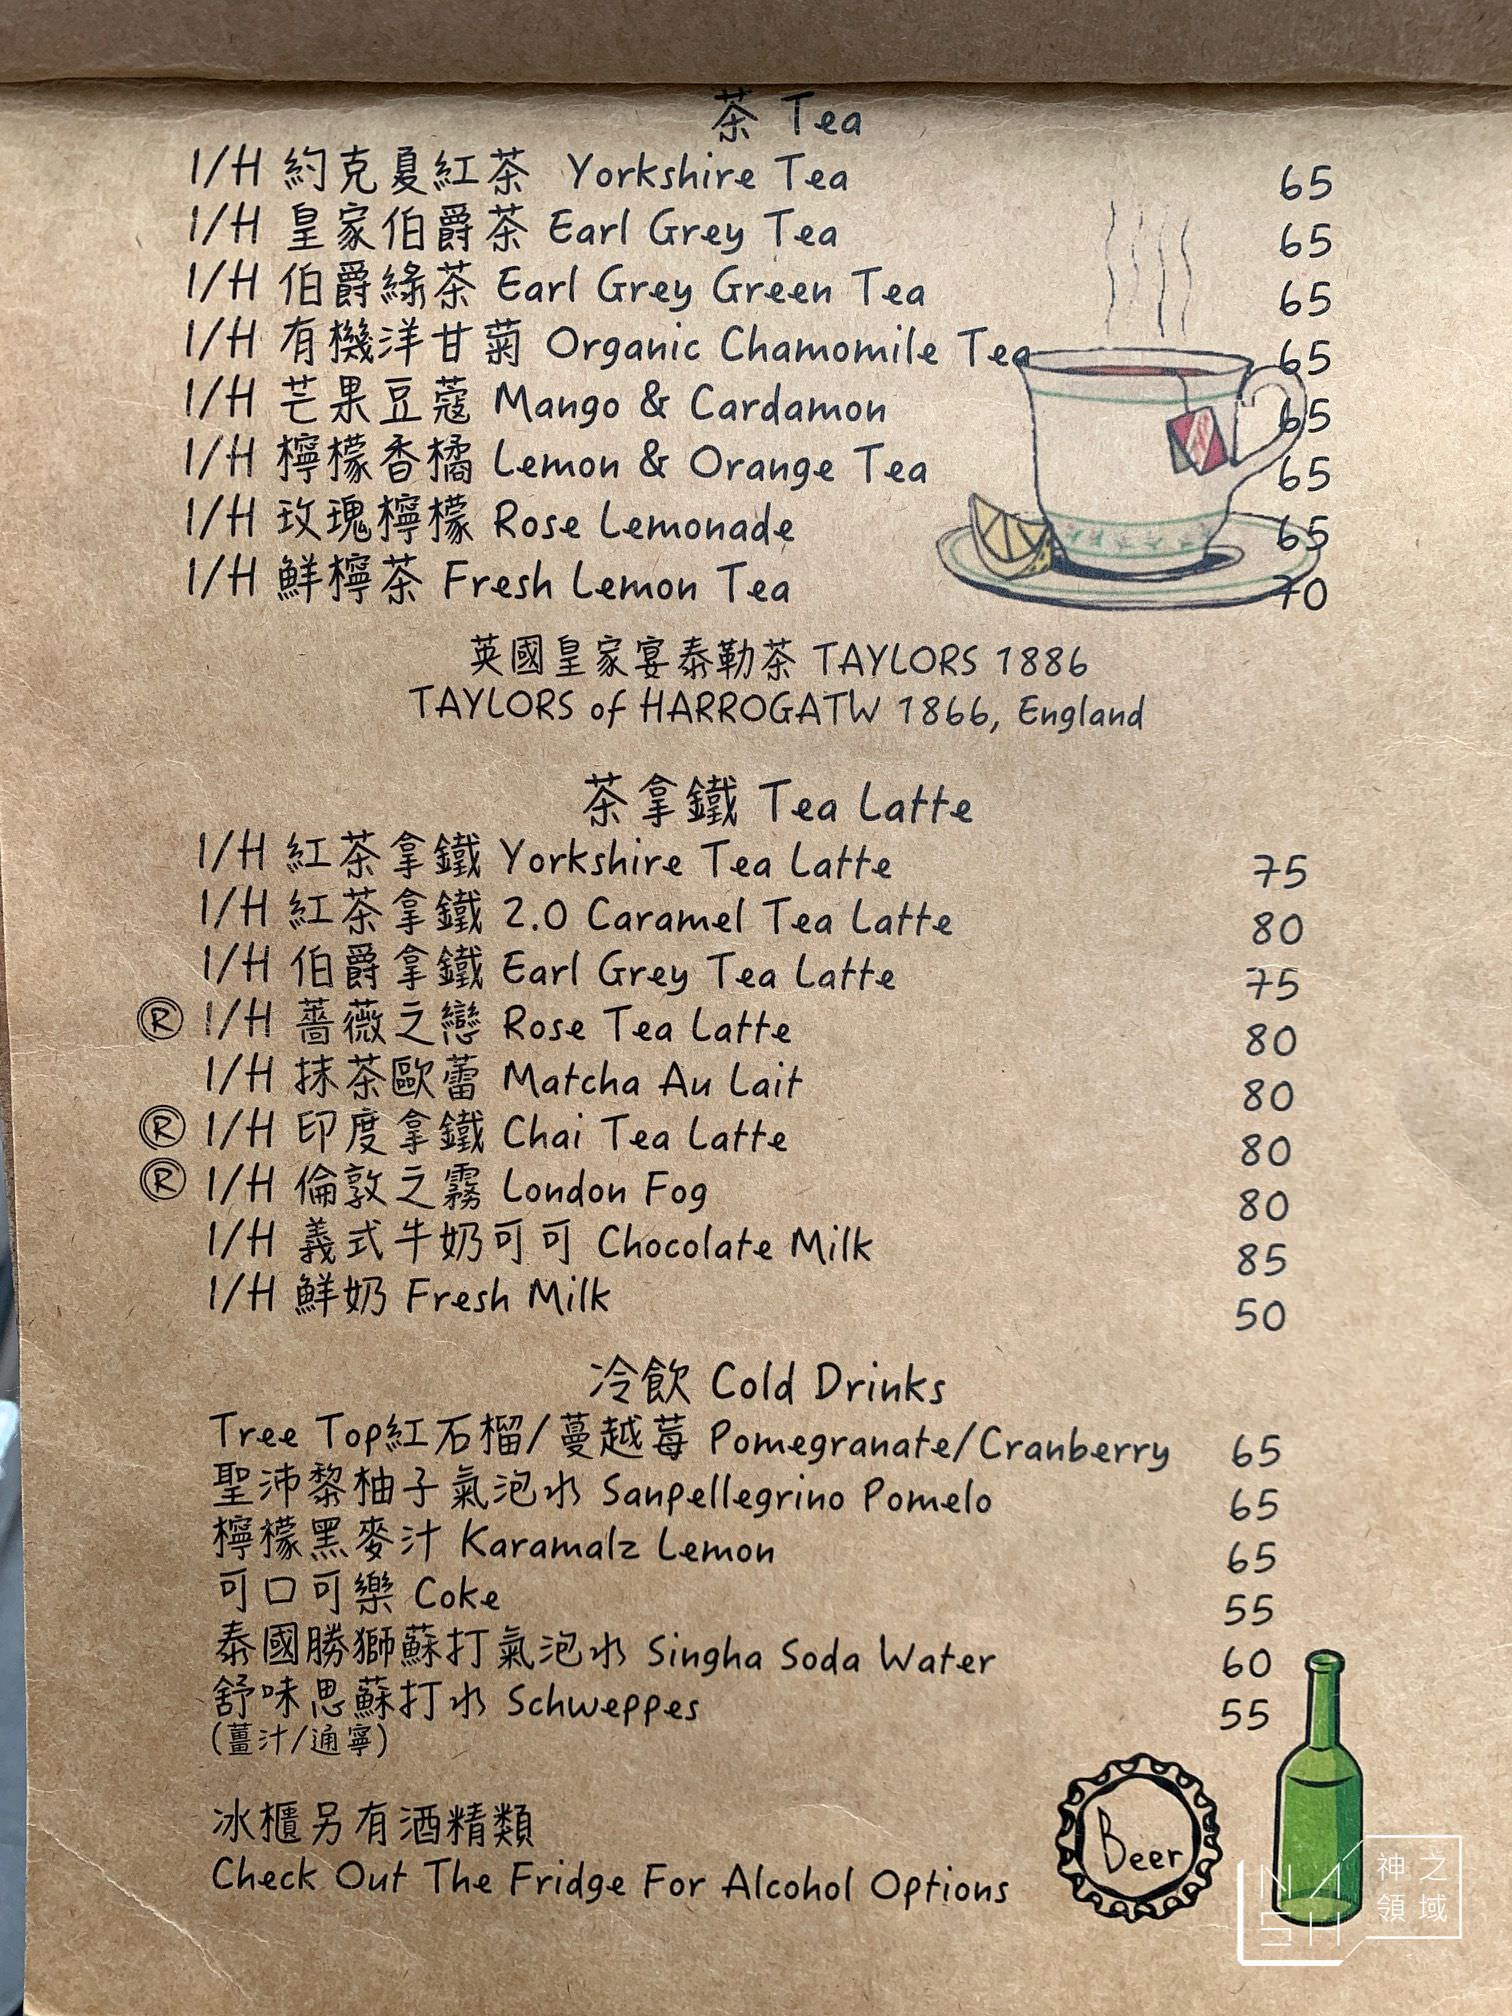 CAFFE' RUE